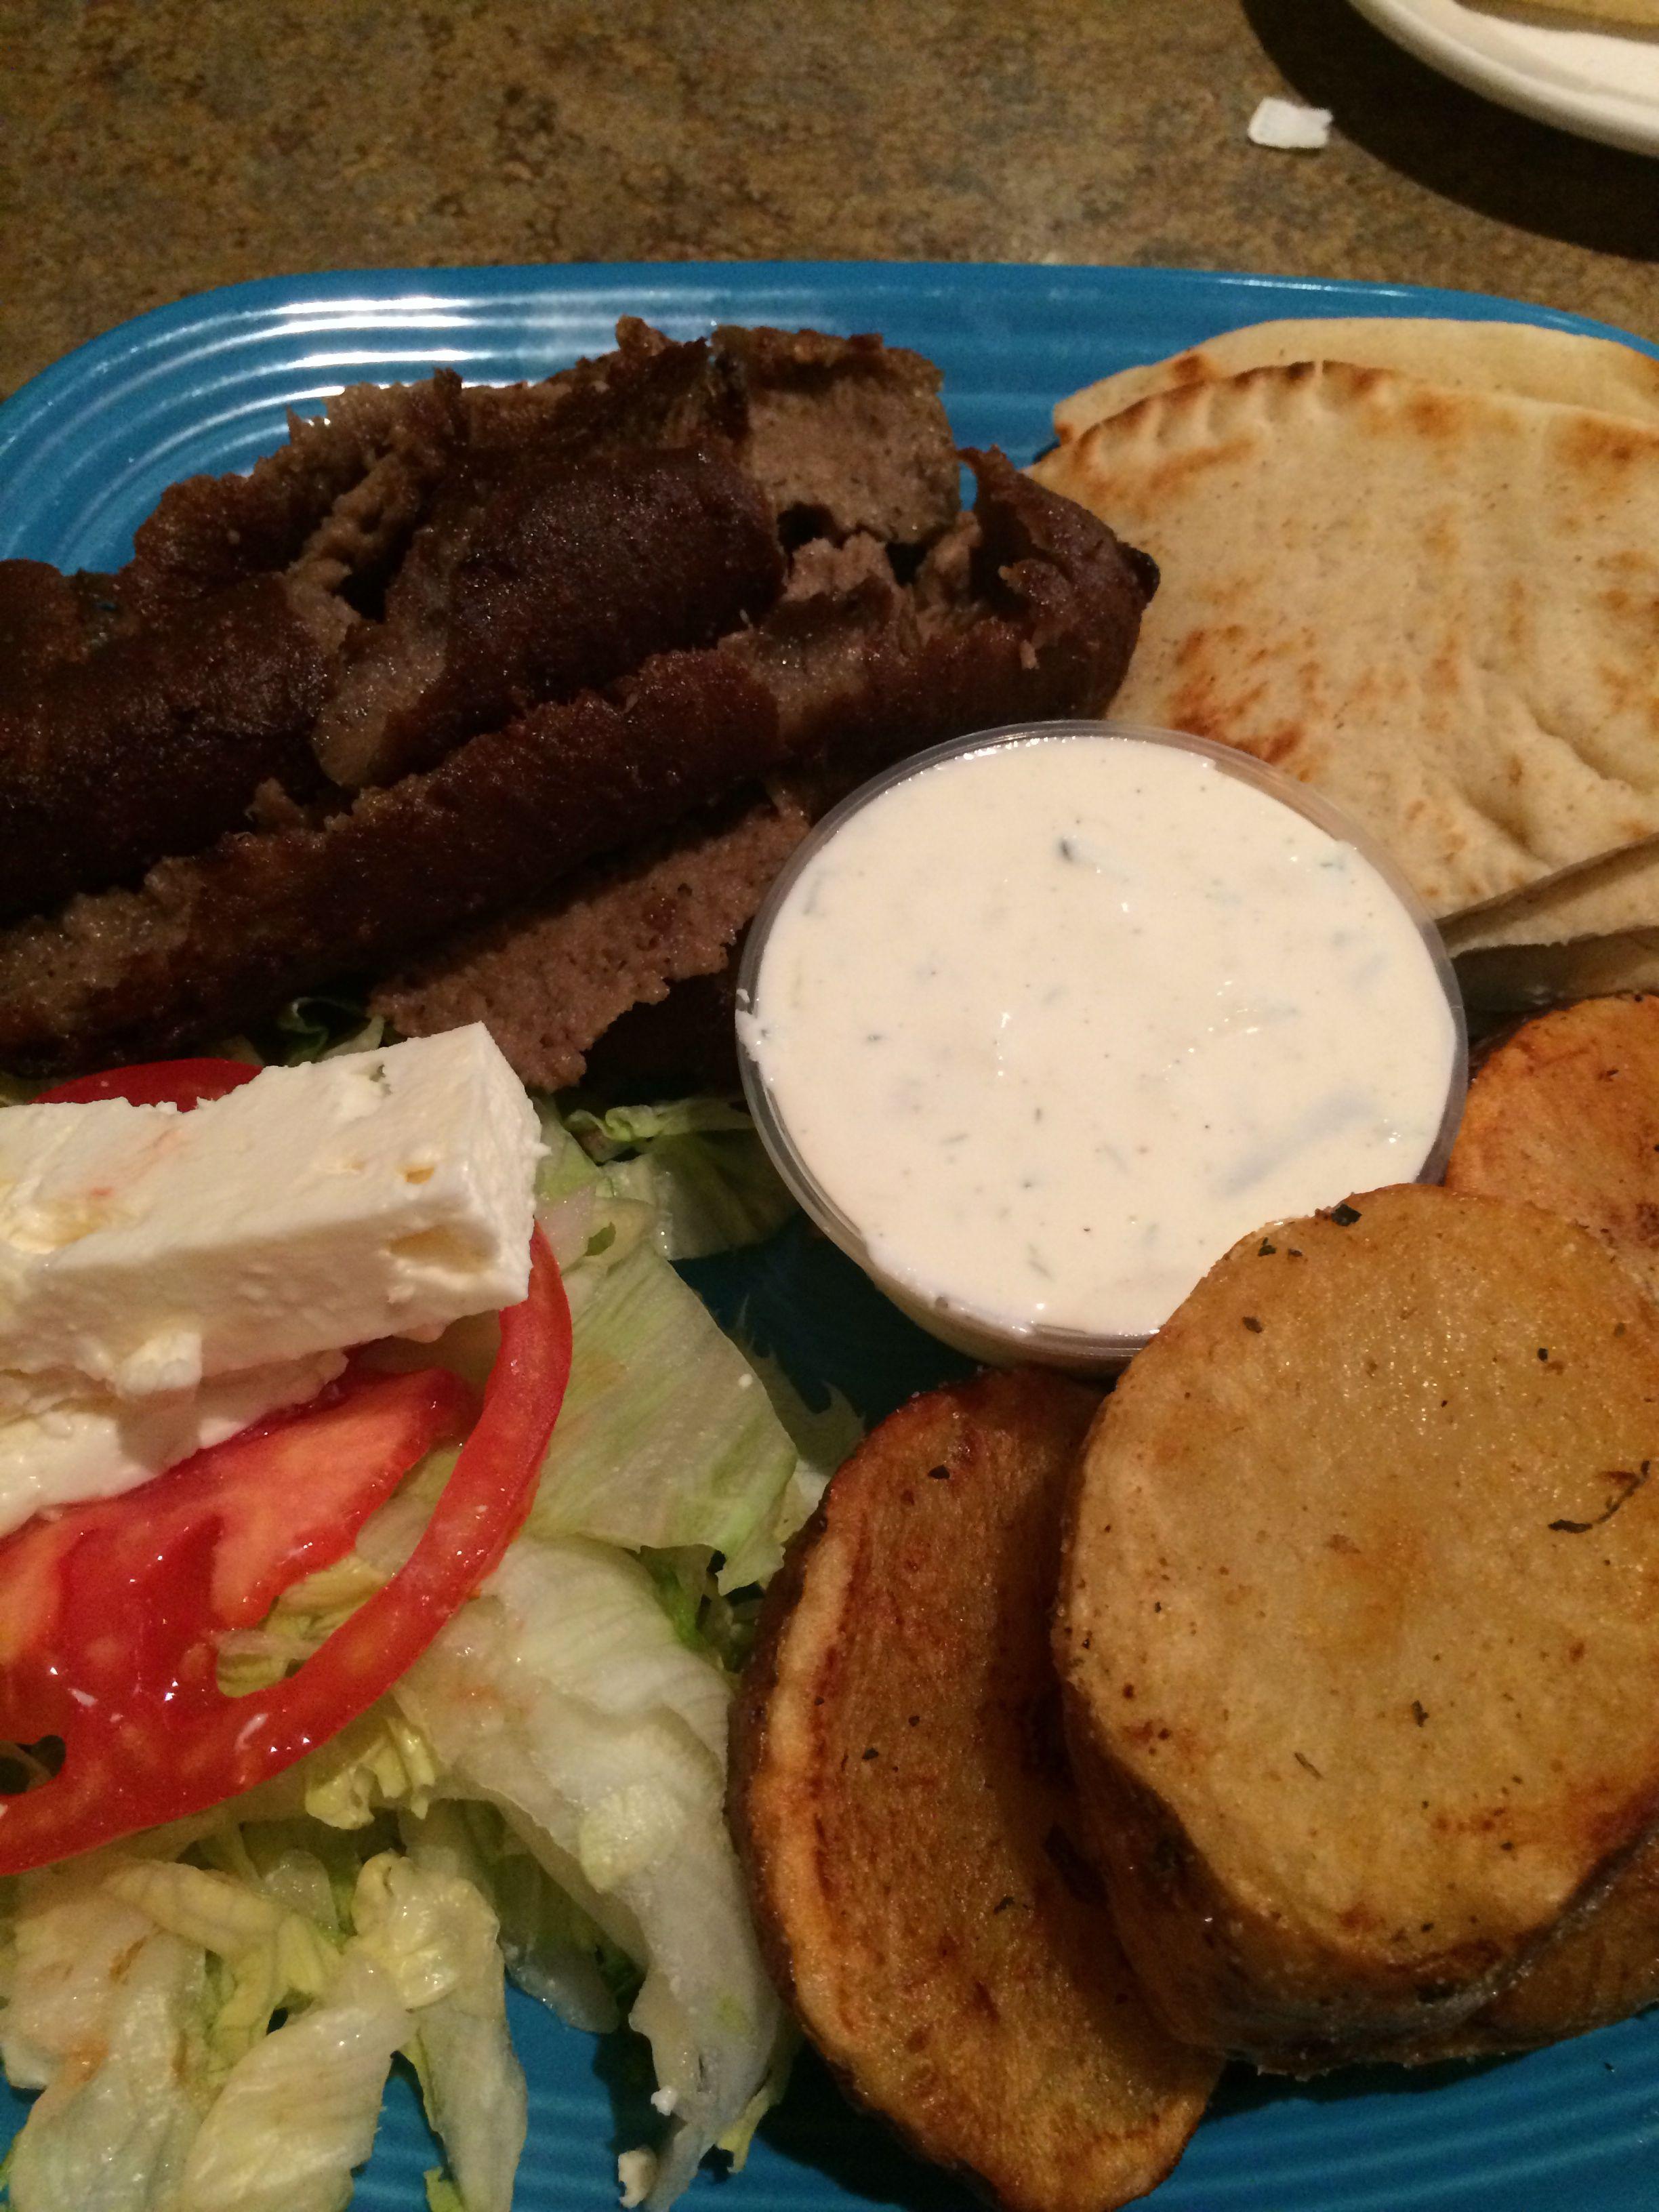 Beef/lamb Gyro platter at Athens Kouzzina. Greek potatoes, salad with feta goat cheese.